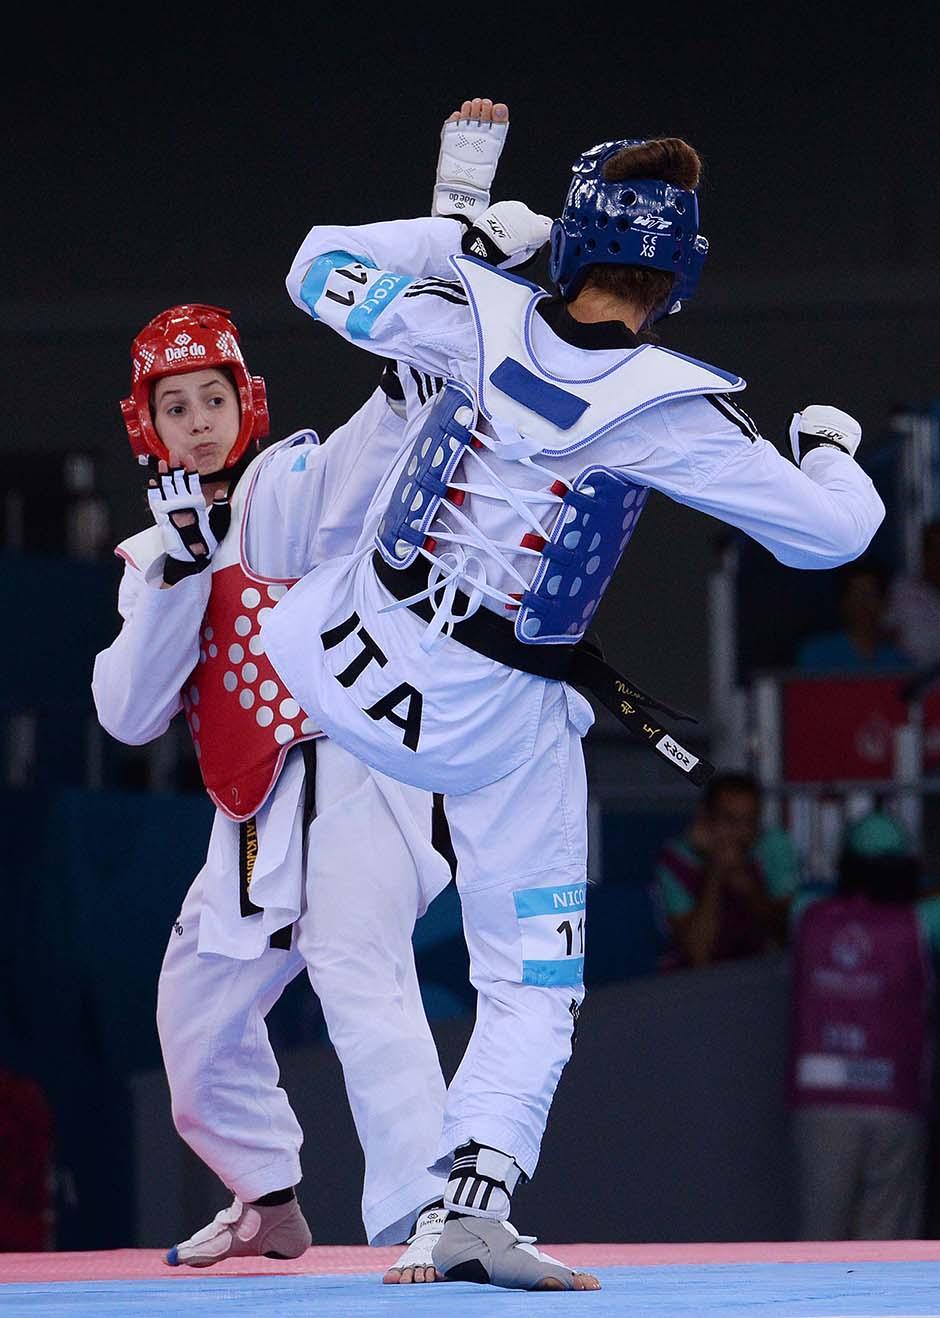 Taekwondo Nicoli foto Ferraro GMT 010